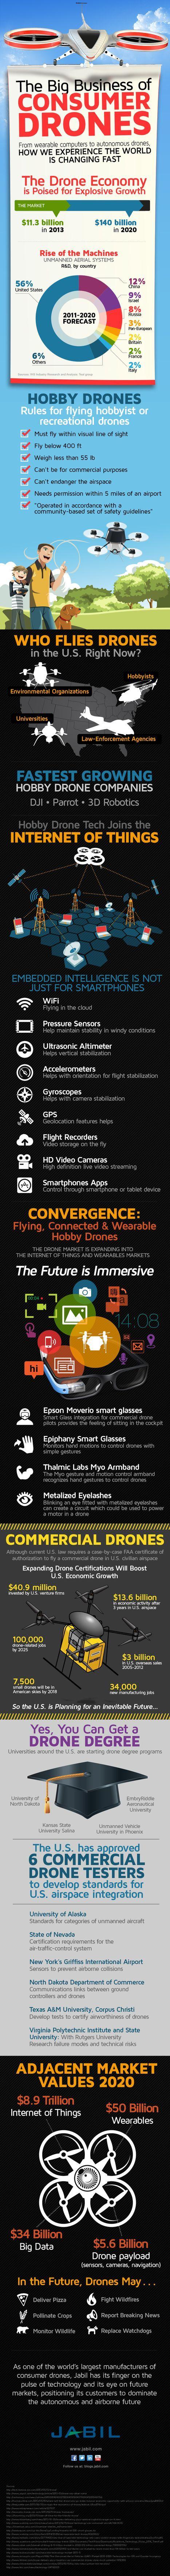 Drone Infographic | Drones, Quadcopters & UAV's